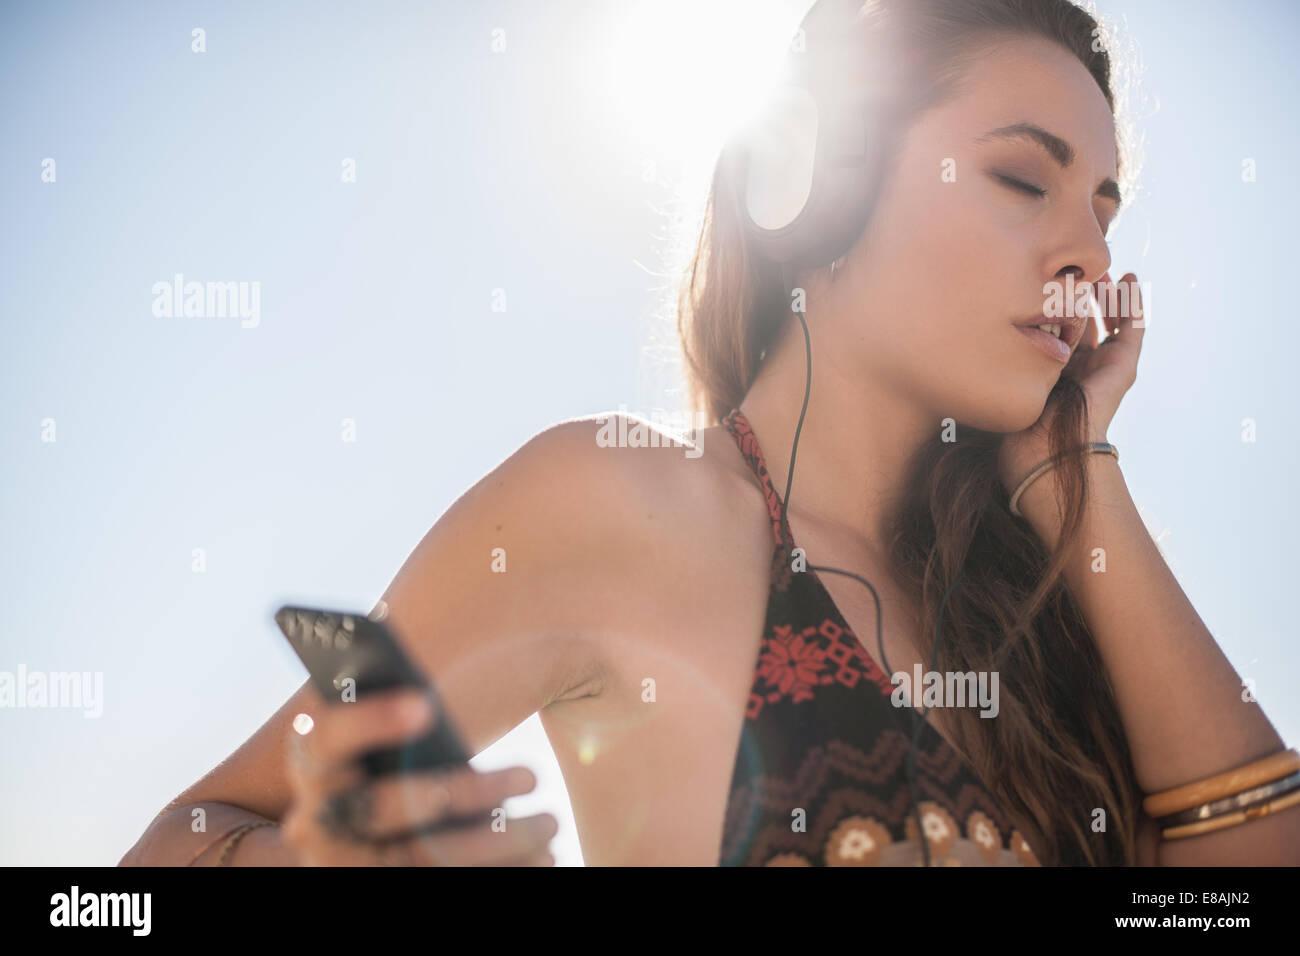 Jeune femme avec les yeux fermés listening to music on headphones at beach, Castiadas, Sardaigne, Italie Photo Stock